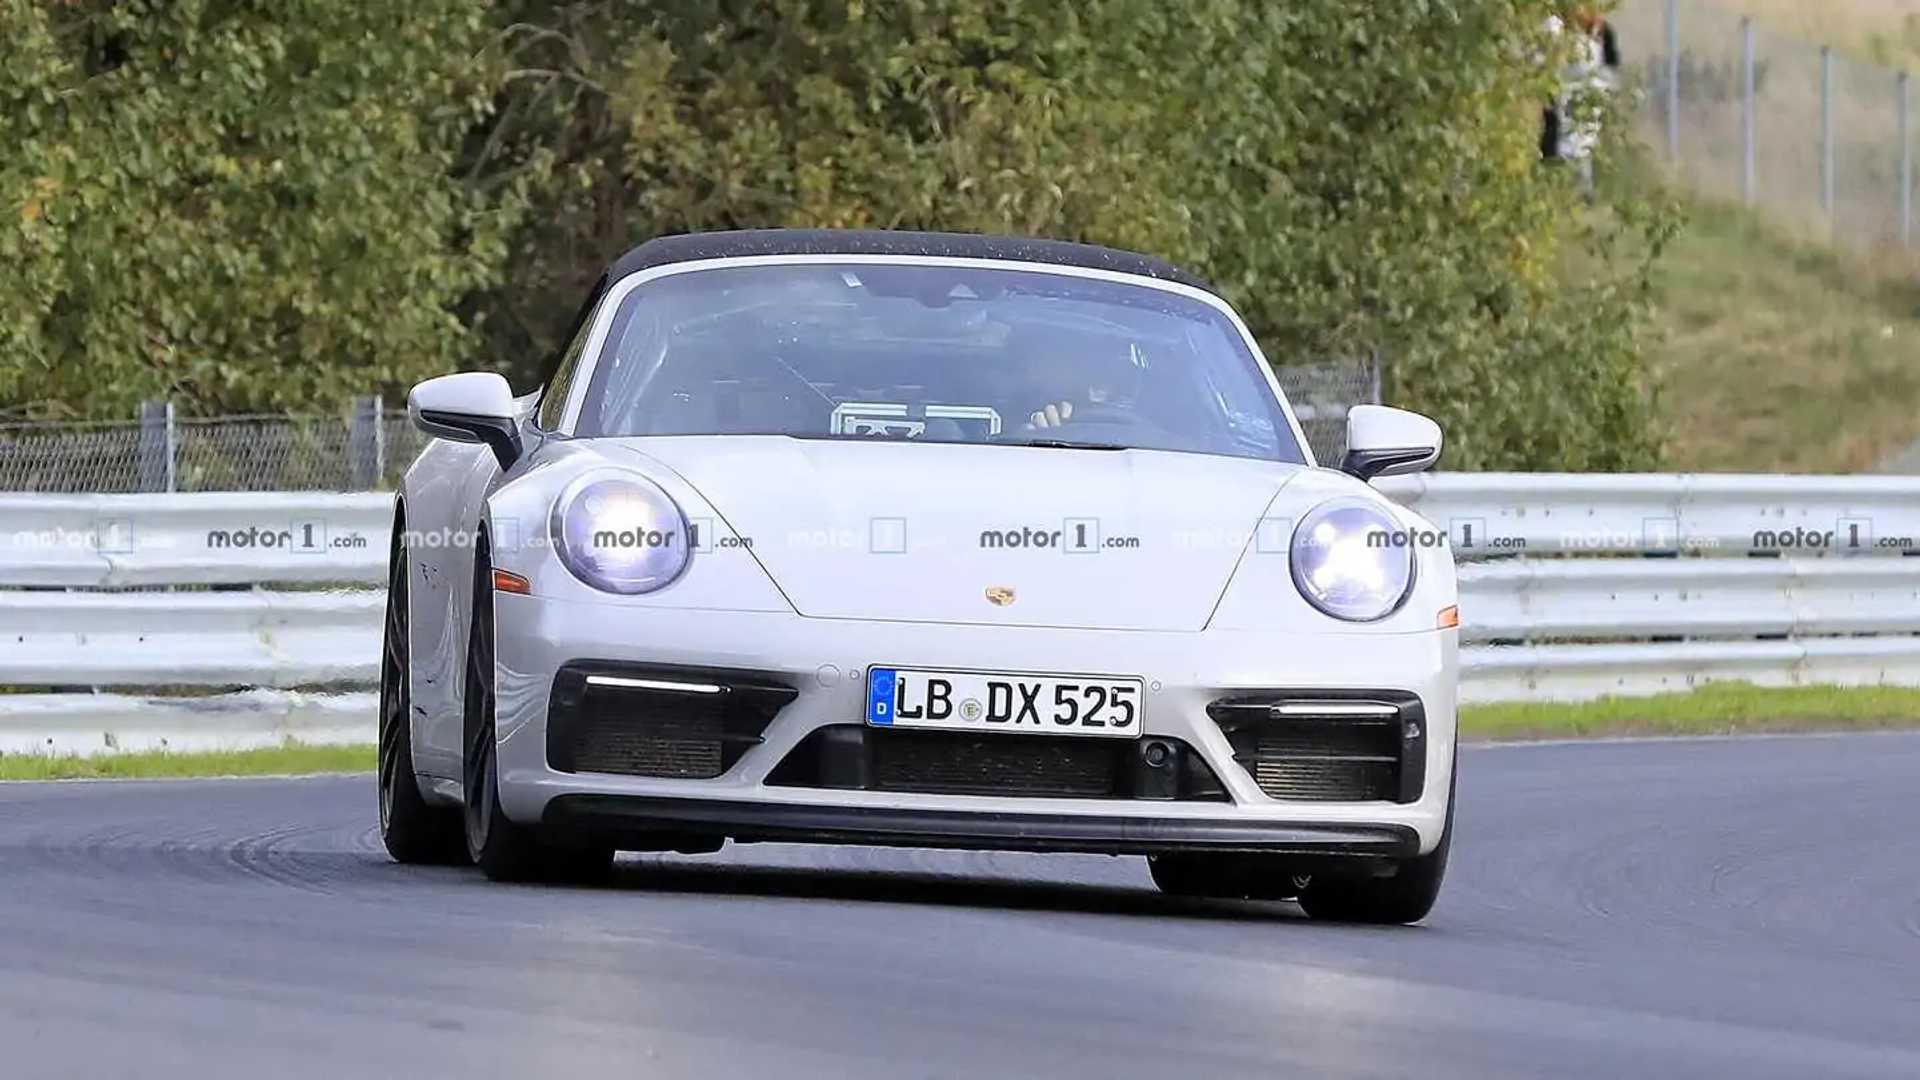 Porsche 911 GTS Cabriolet Spy Shots